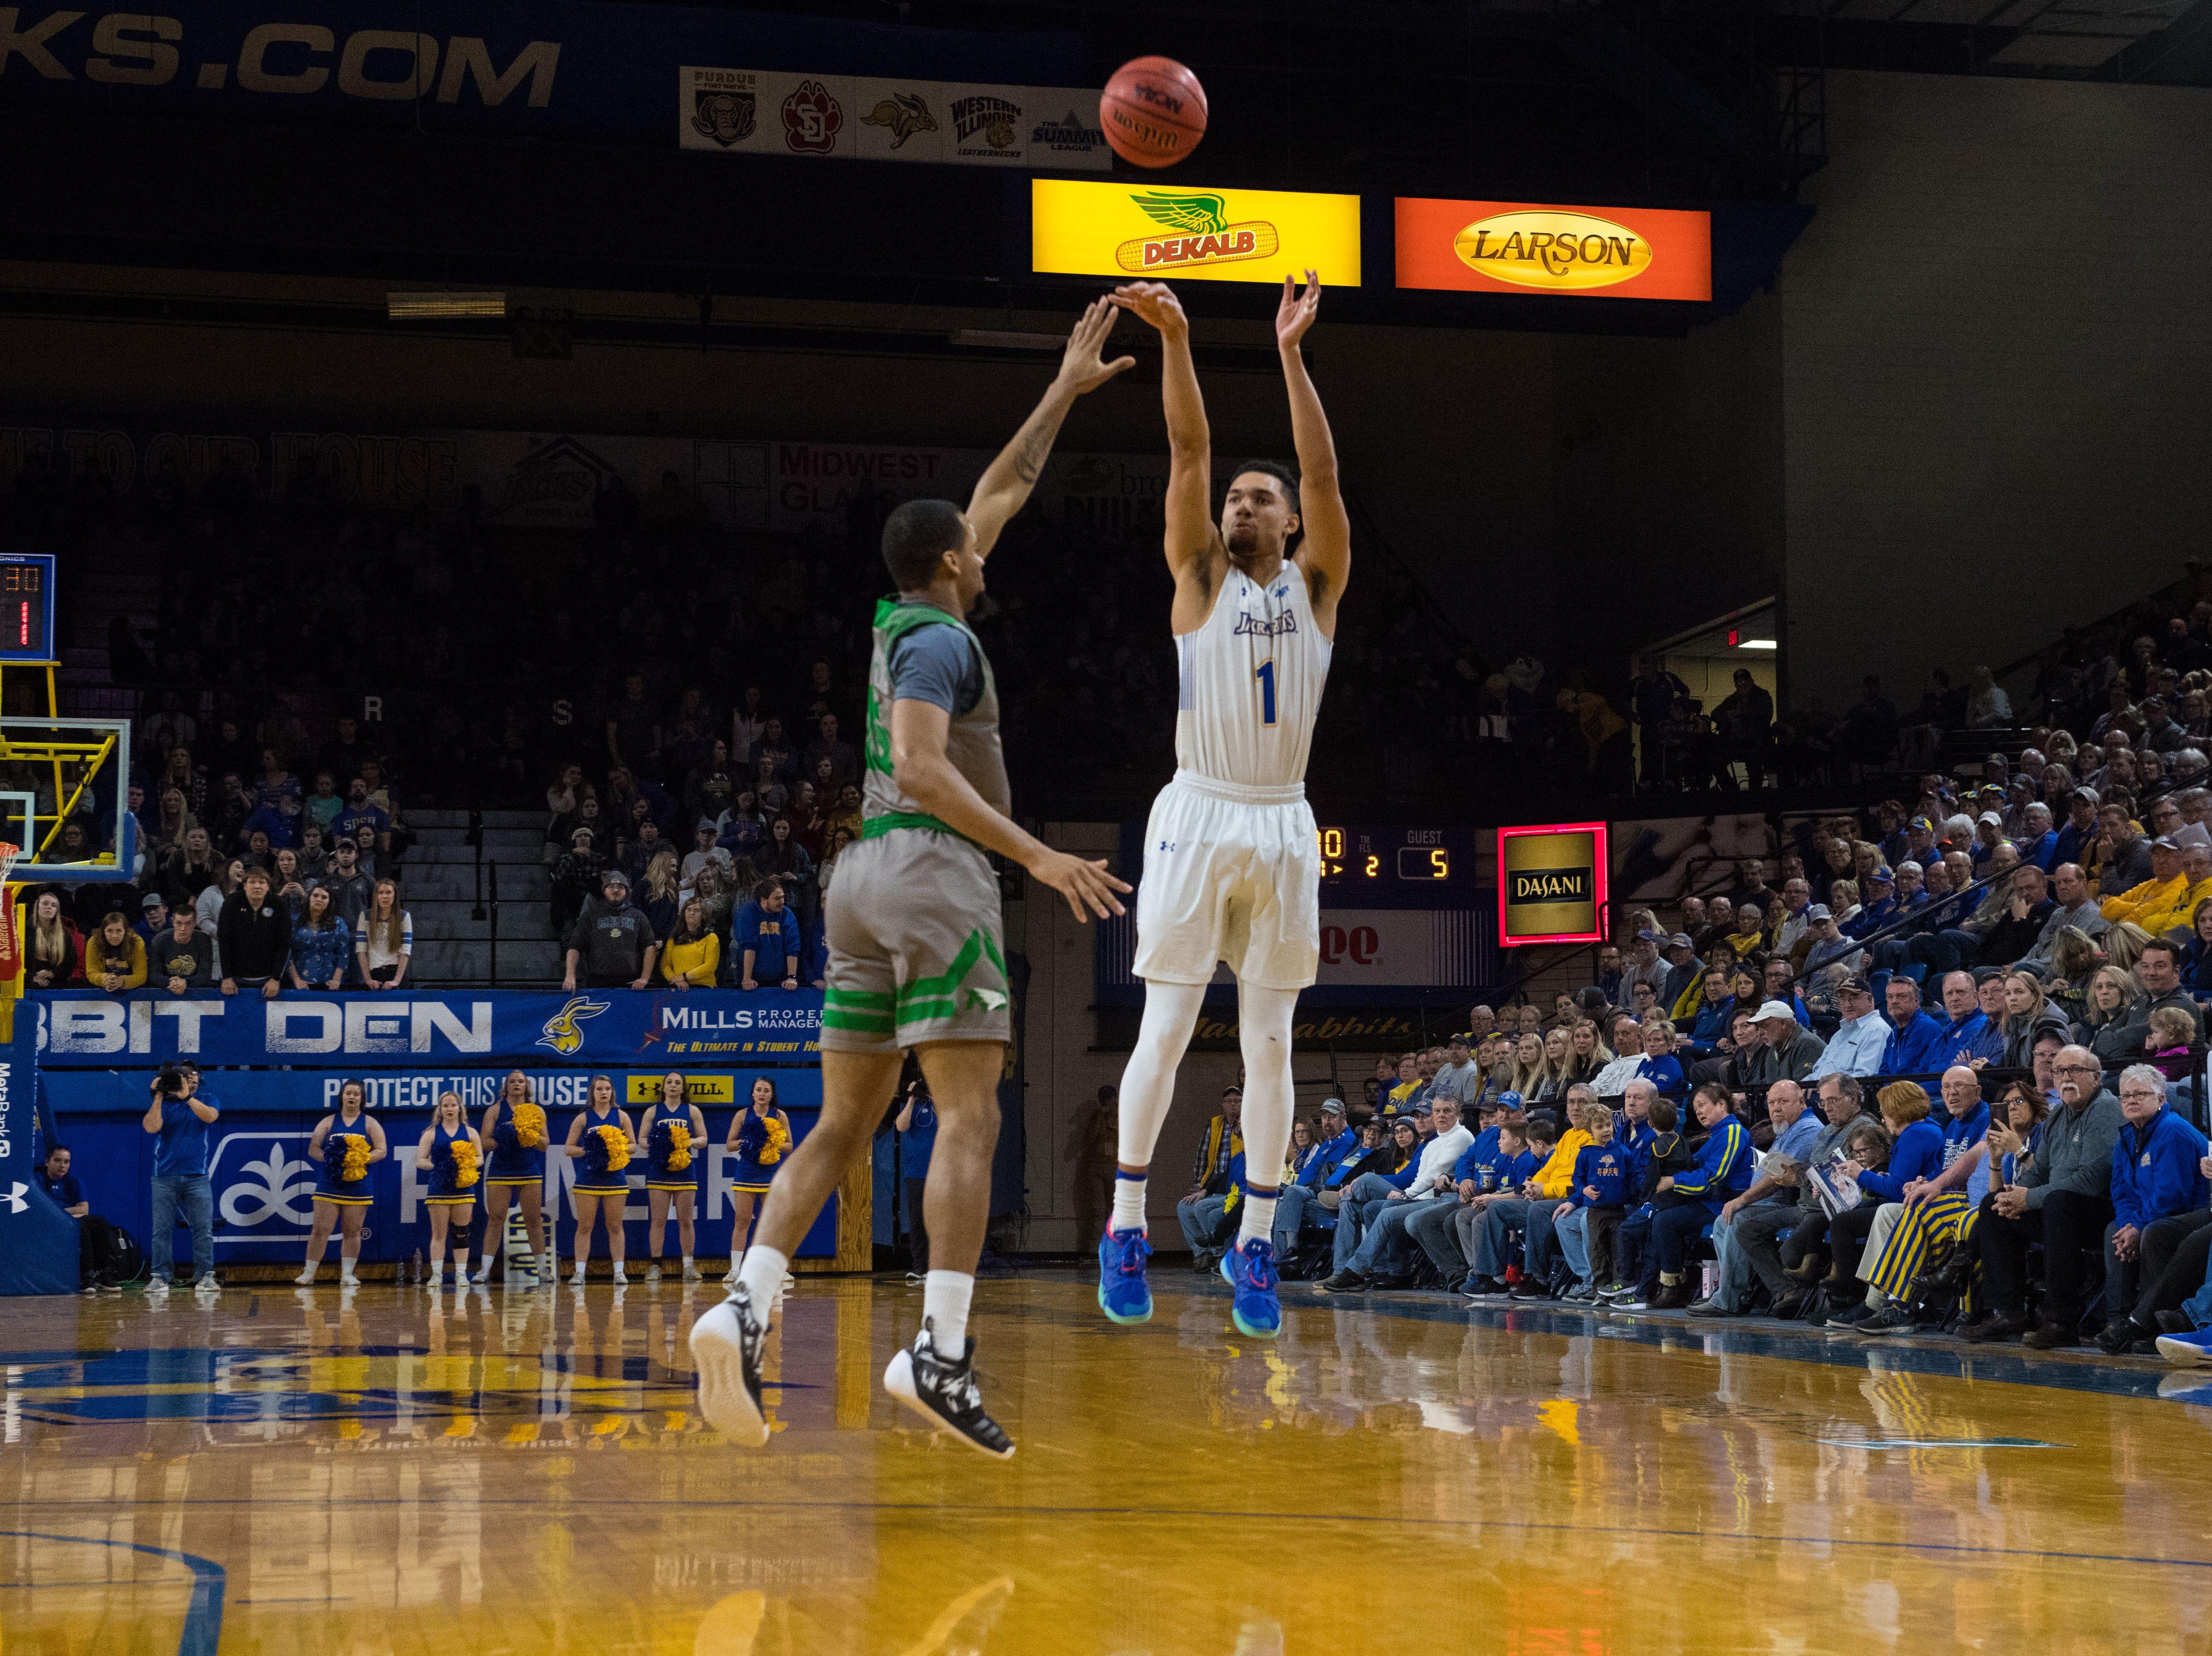 South Dakota State's Skyler Flatten (1) shoots the ball during a game against North Dakota in Brookings, S.D., Saturday, Feb. 9, 2019.